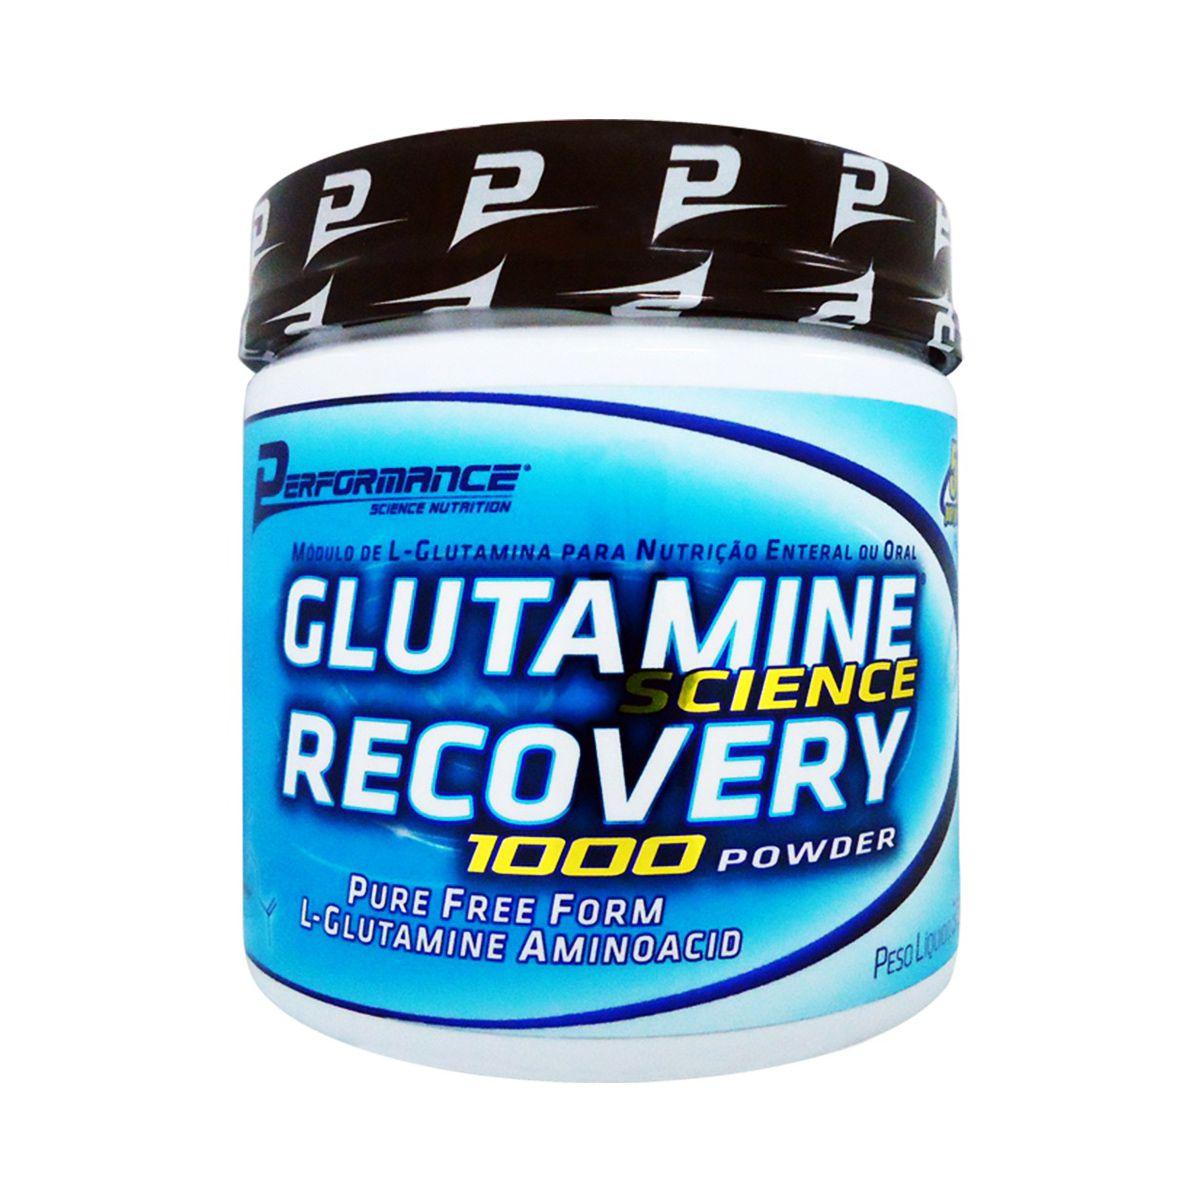 Glutamina Science Recovery 1000 Powder 300g